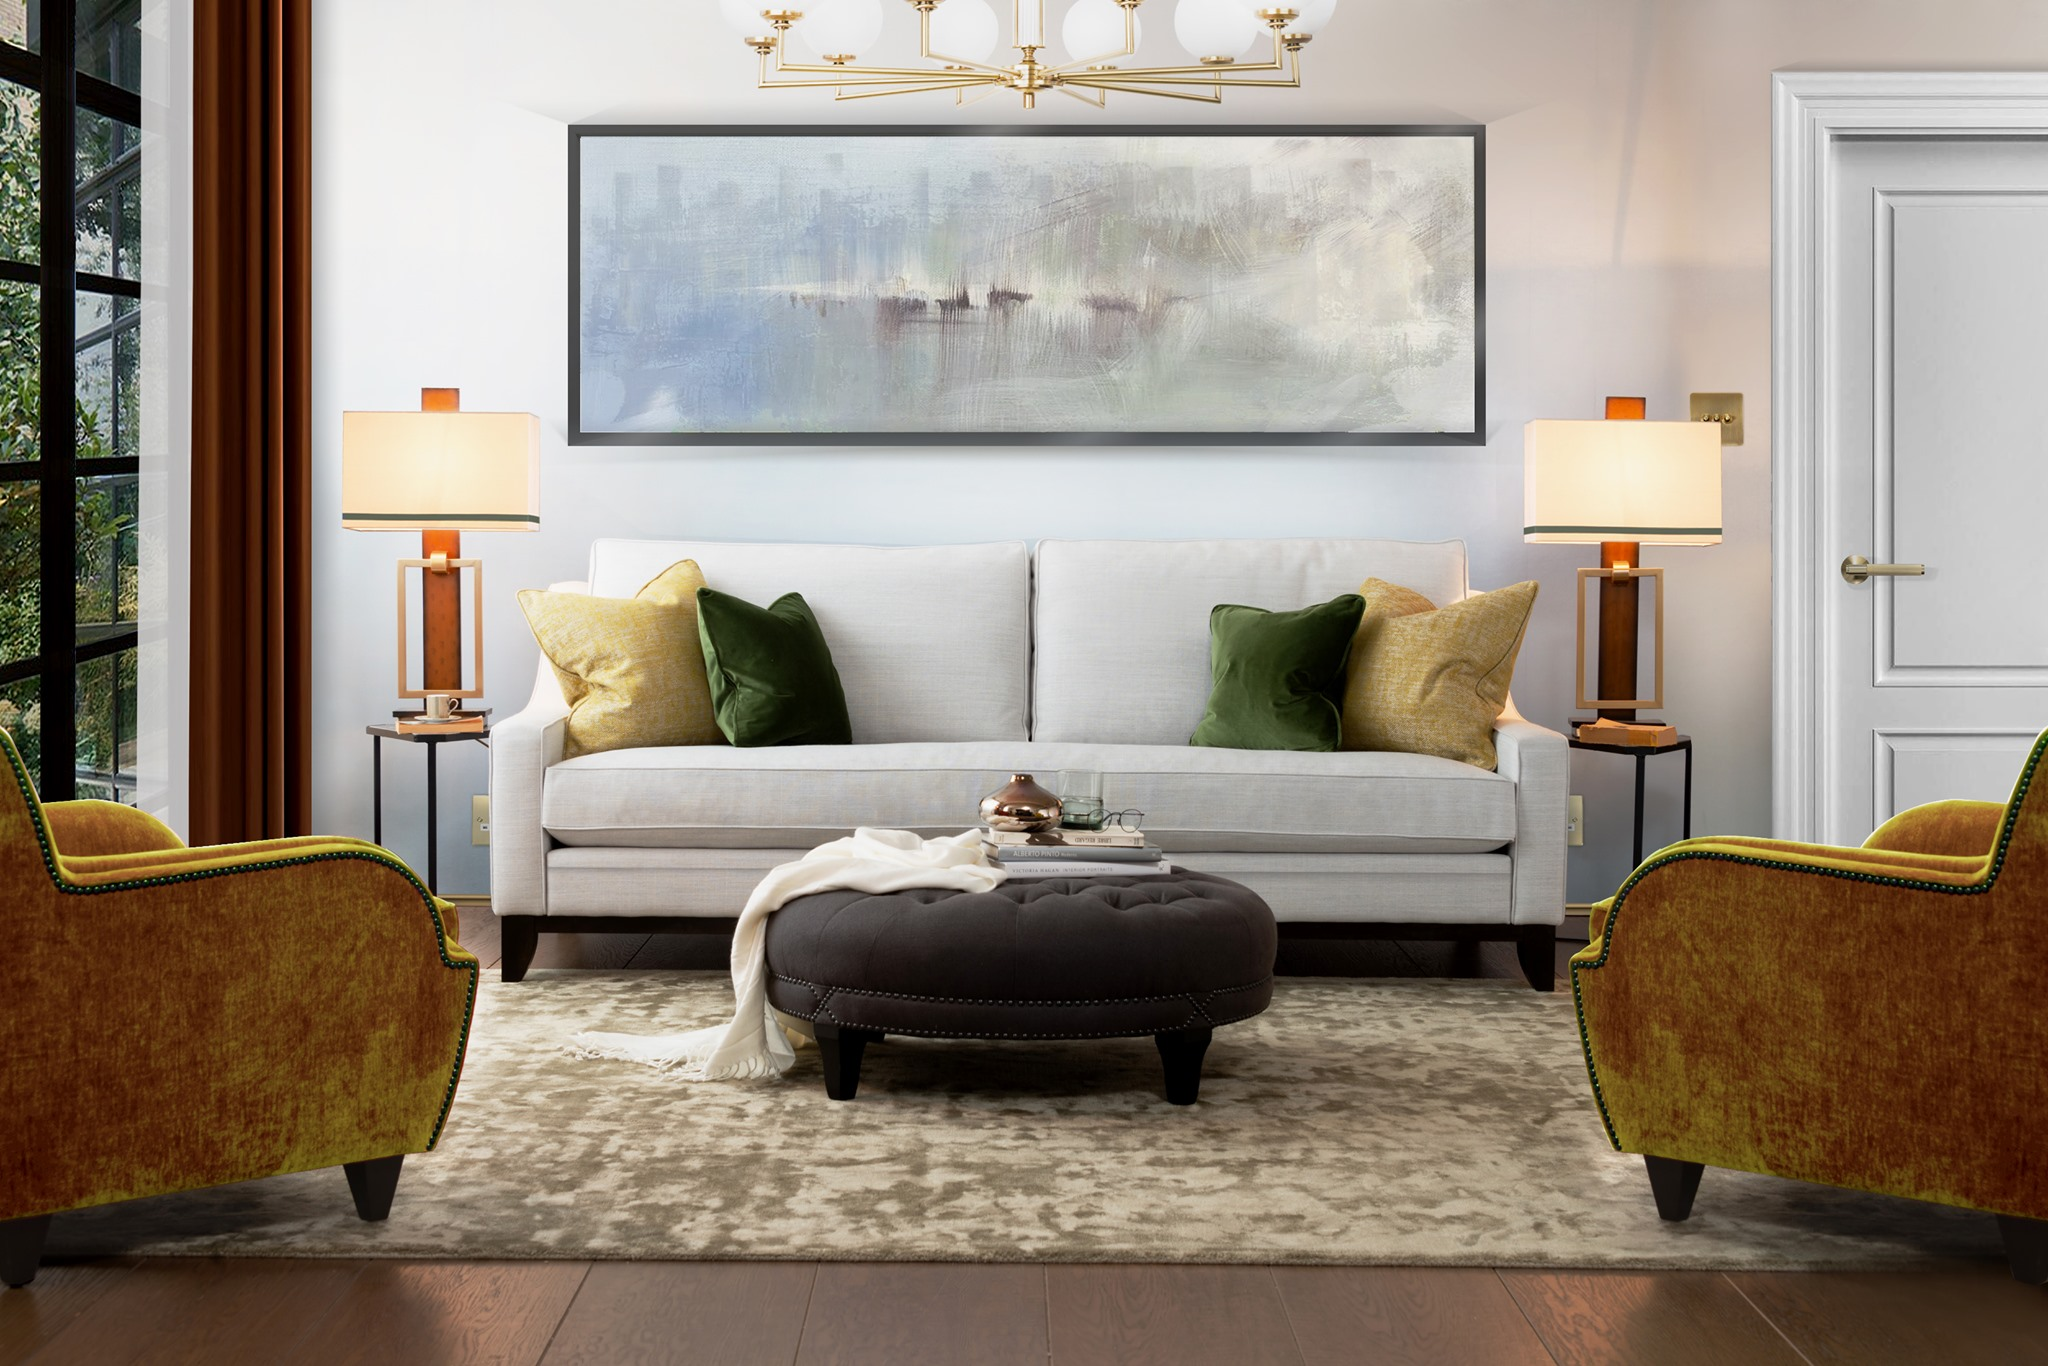 John Sankey sofas and chairs